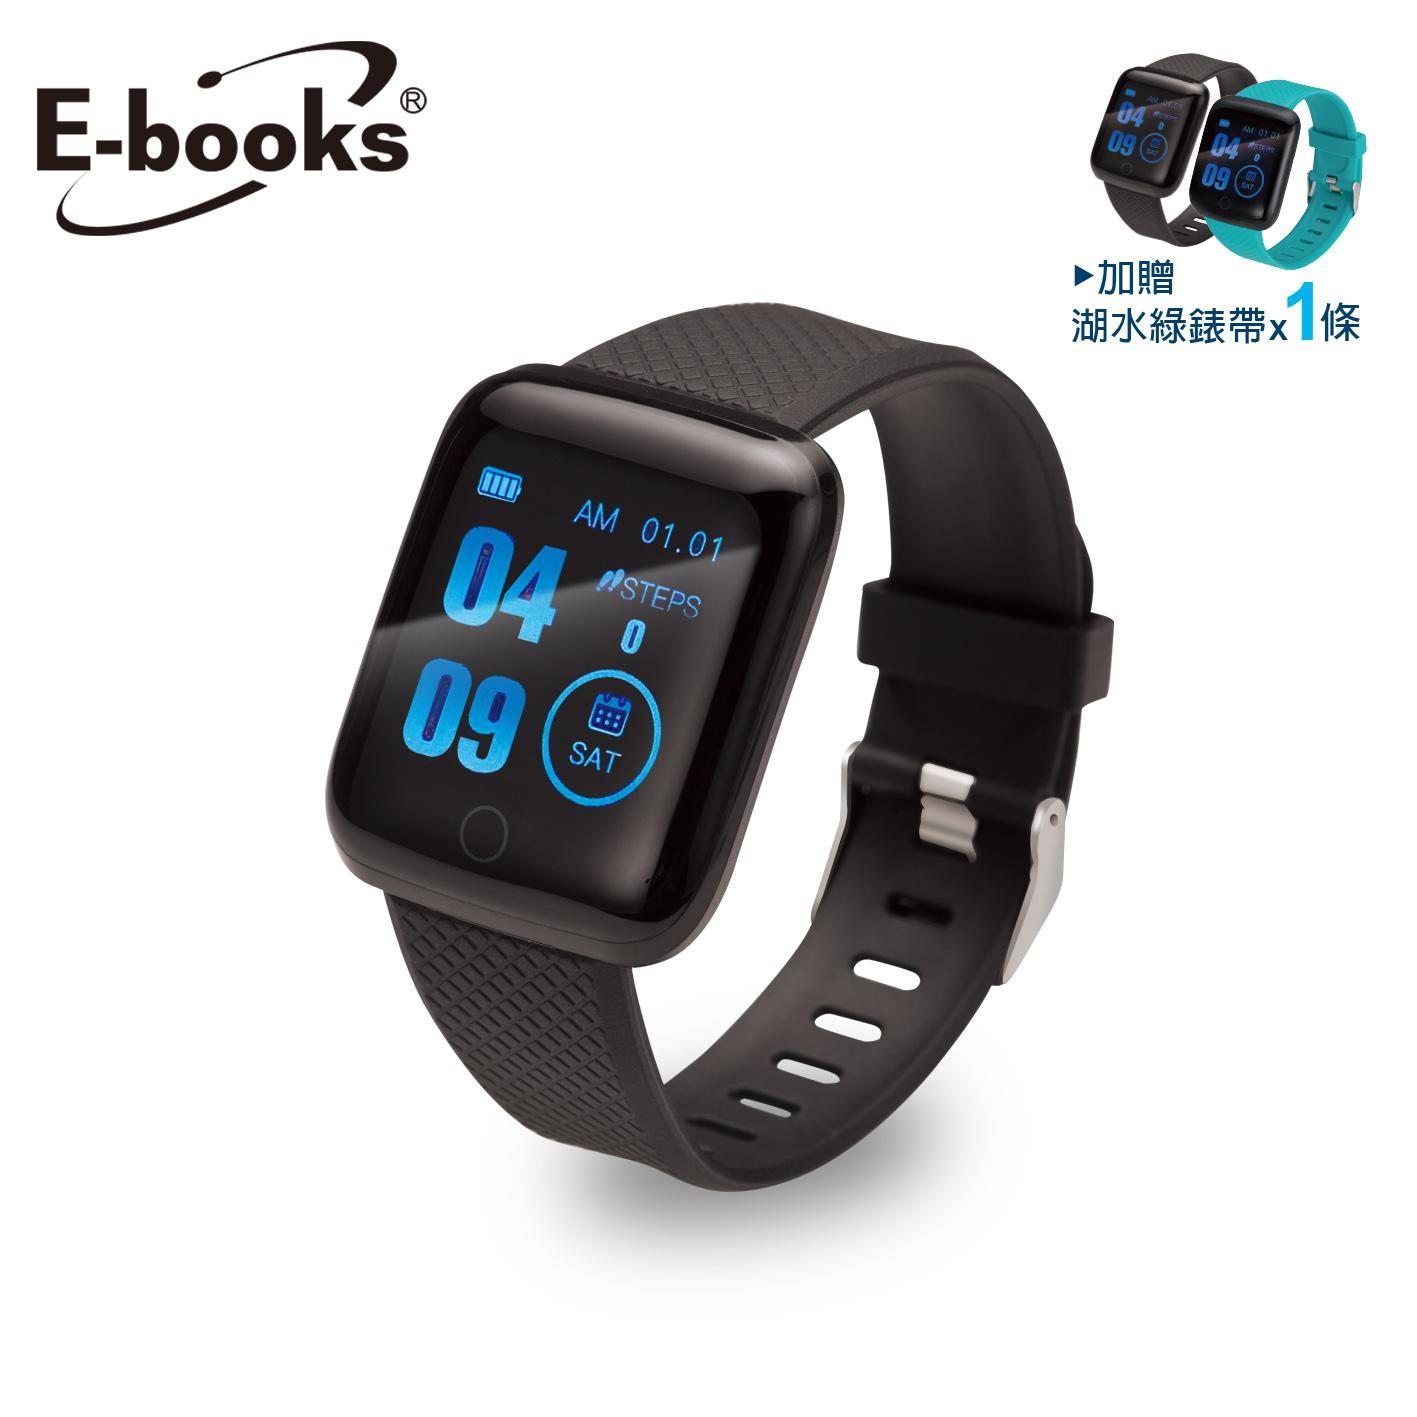 E-books V8 藍牙彩屏大錶面健康智慧手錶【血氧檢測】